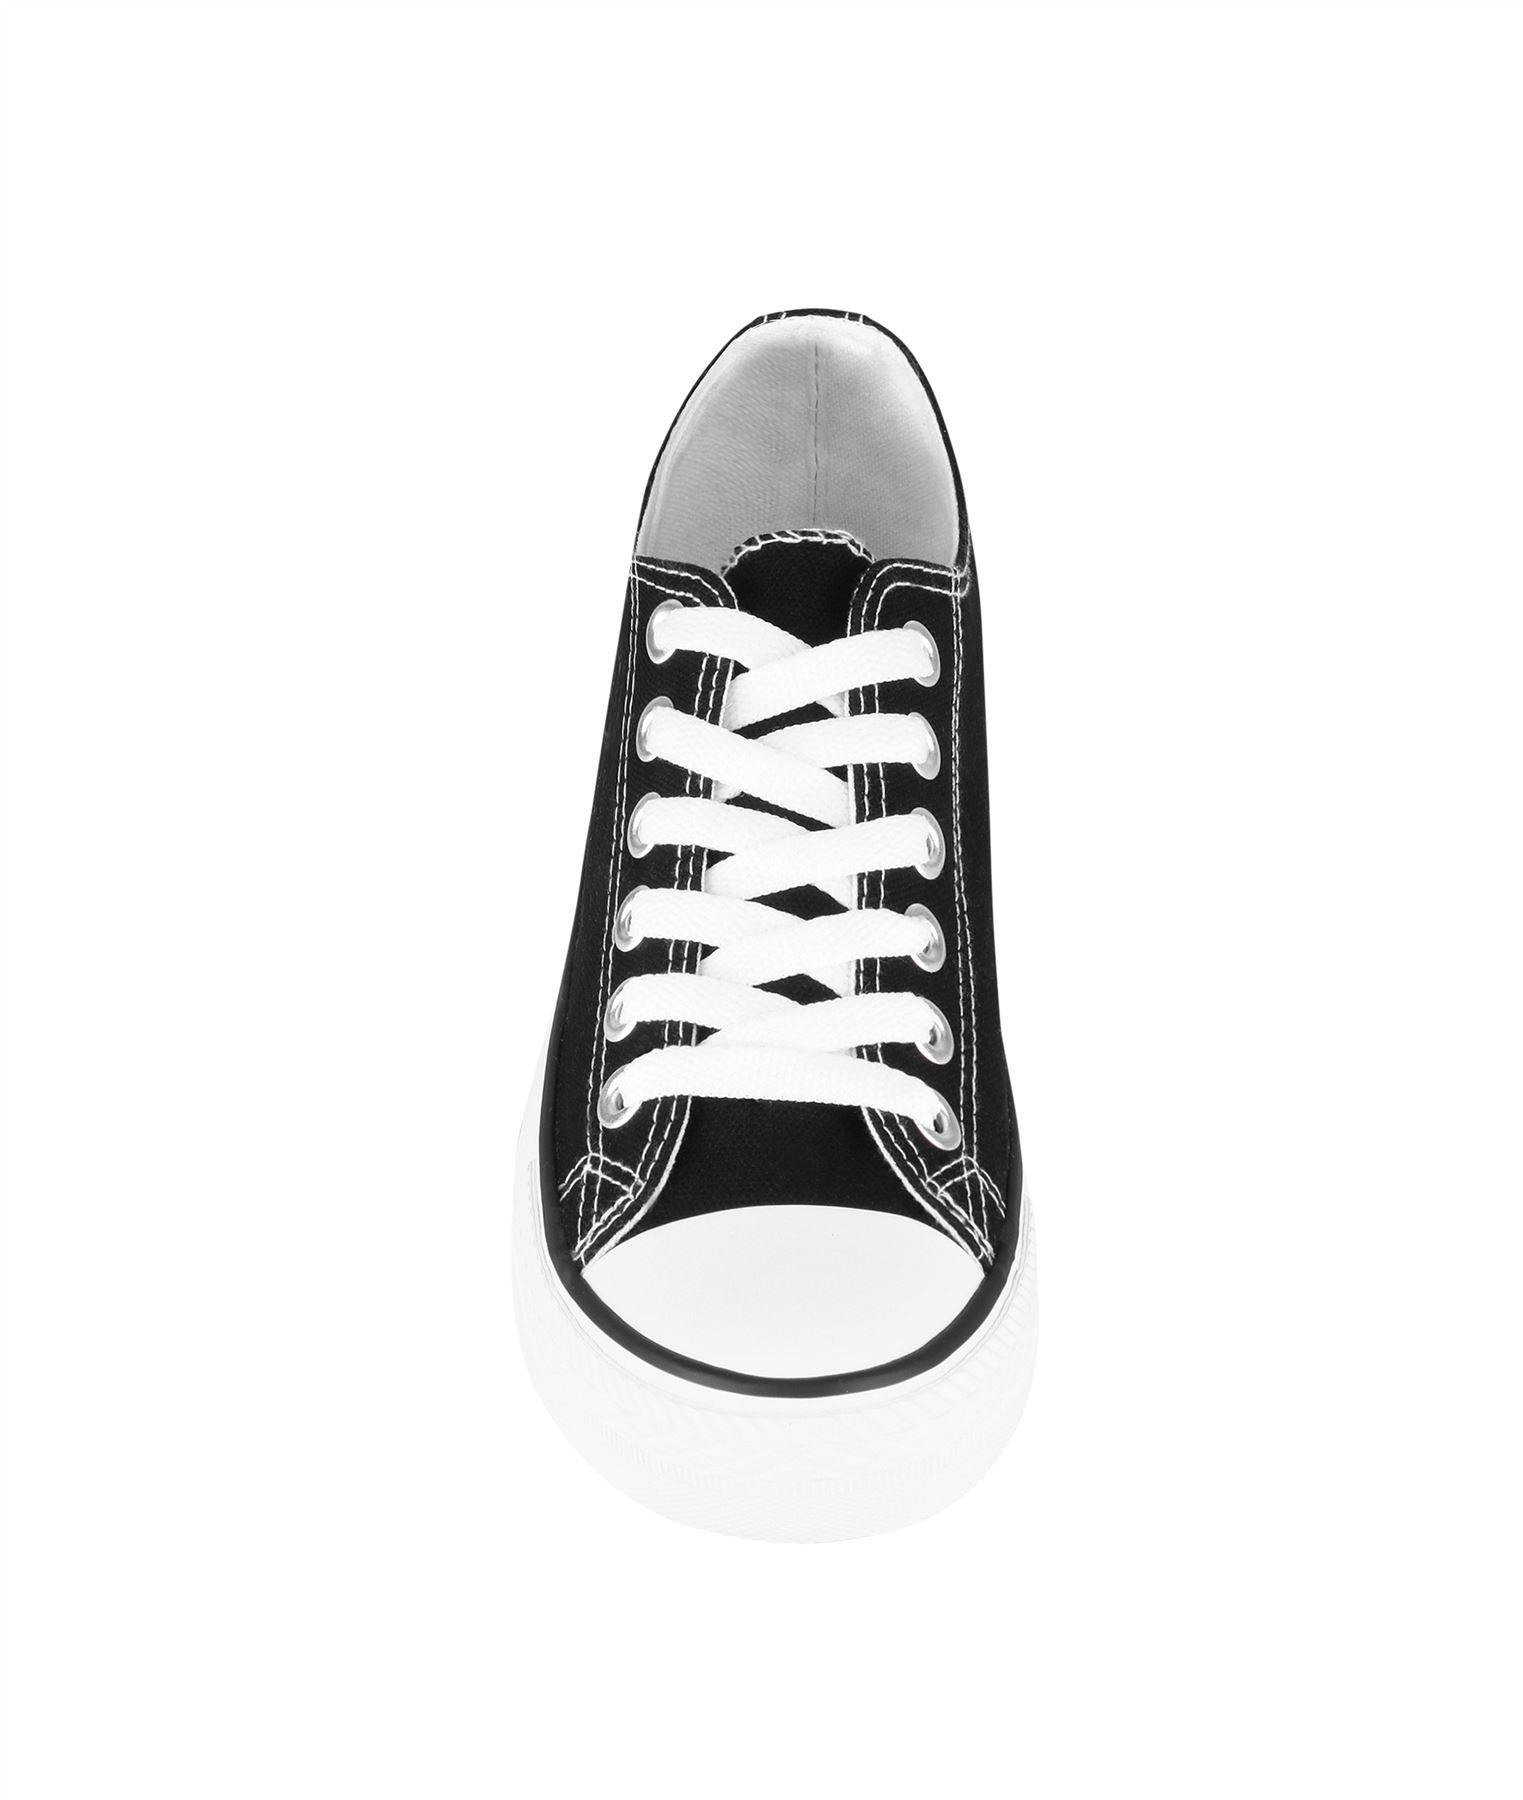 Zapatillas-Mujer-Casuales-Deportiva-Barata-Lona-Moda-Originales-Outlet-Tela-Moda miniatura 34